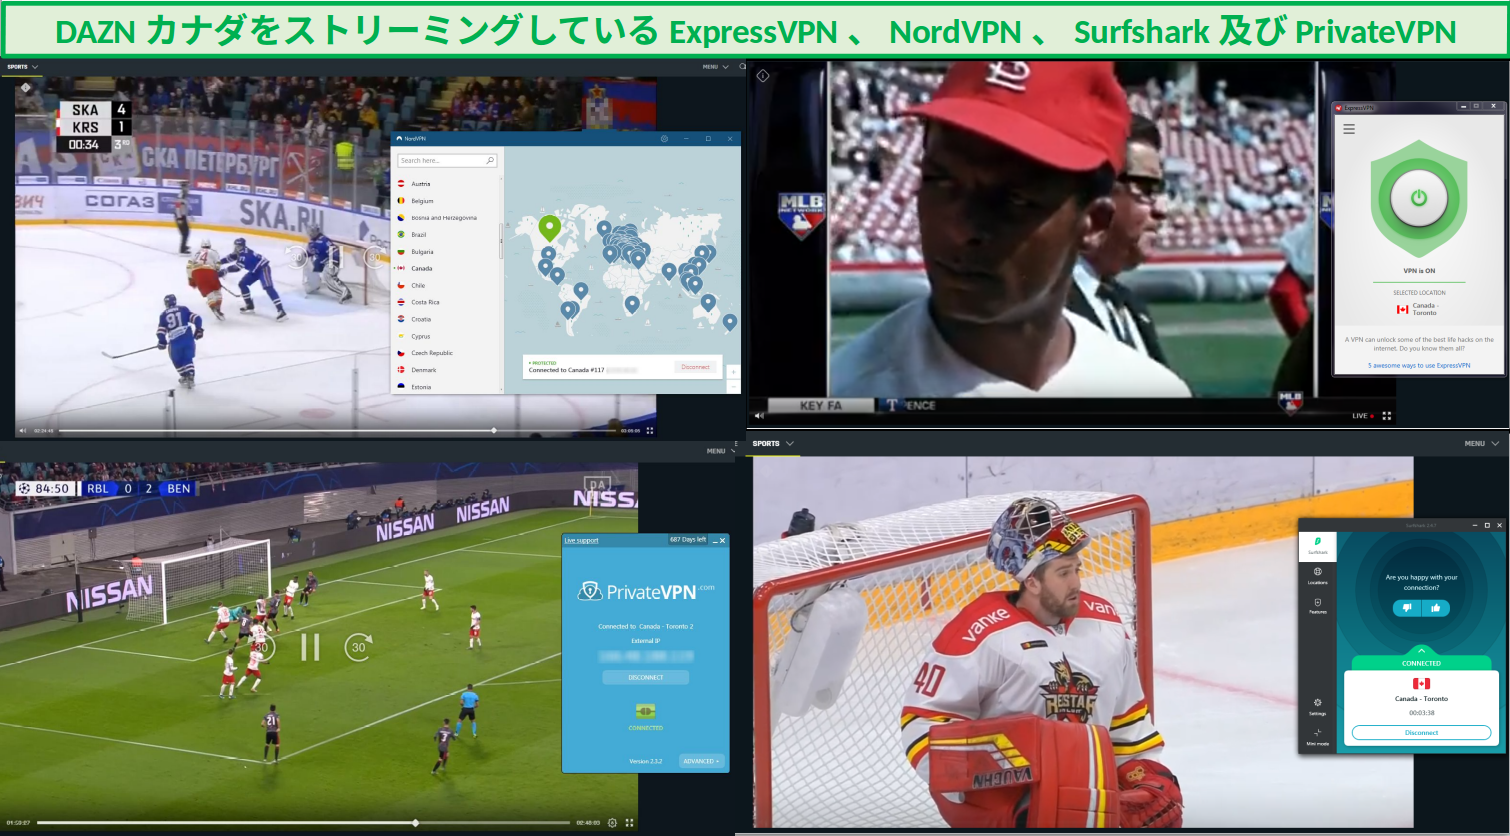 ExpressVPN、NordVPN、SurfSharkおよびPrivateVPNを使用したDAZNのストリーミング